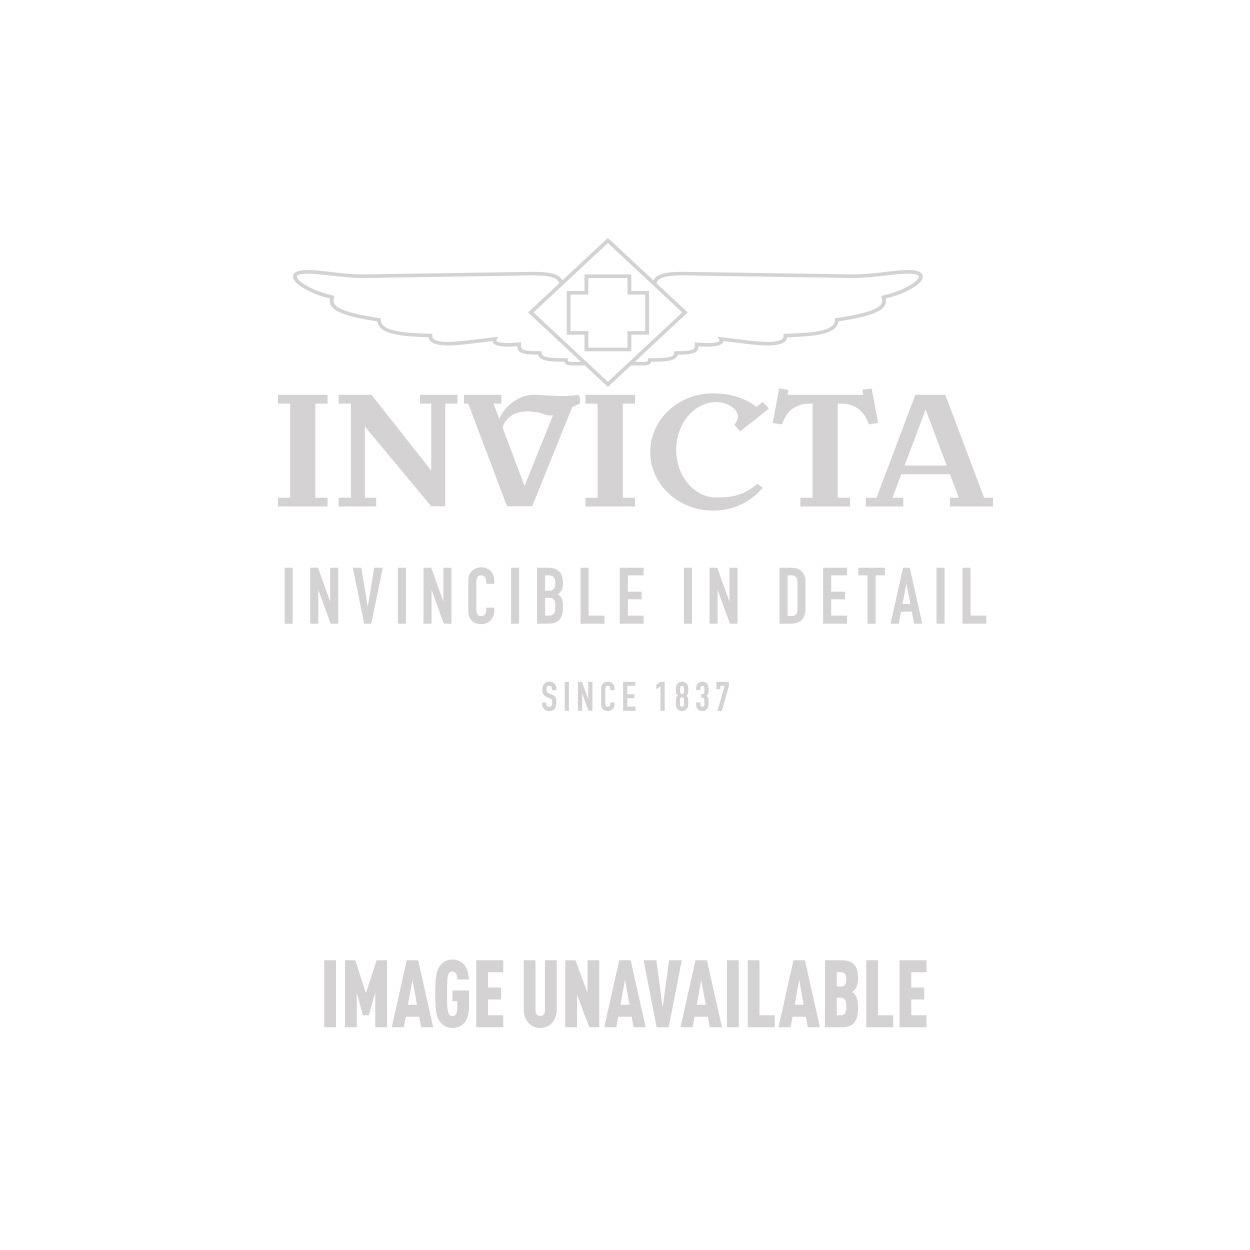 Invicta Watch Case DC3GRN/GLOW